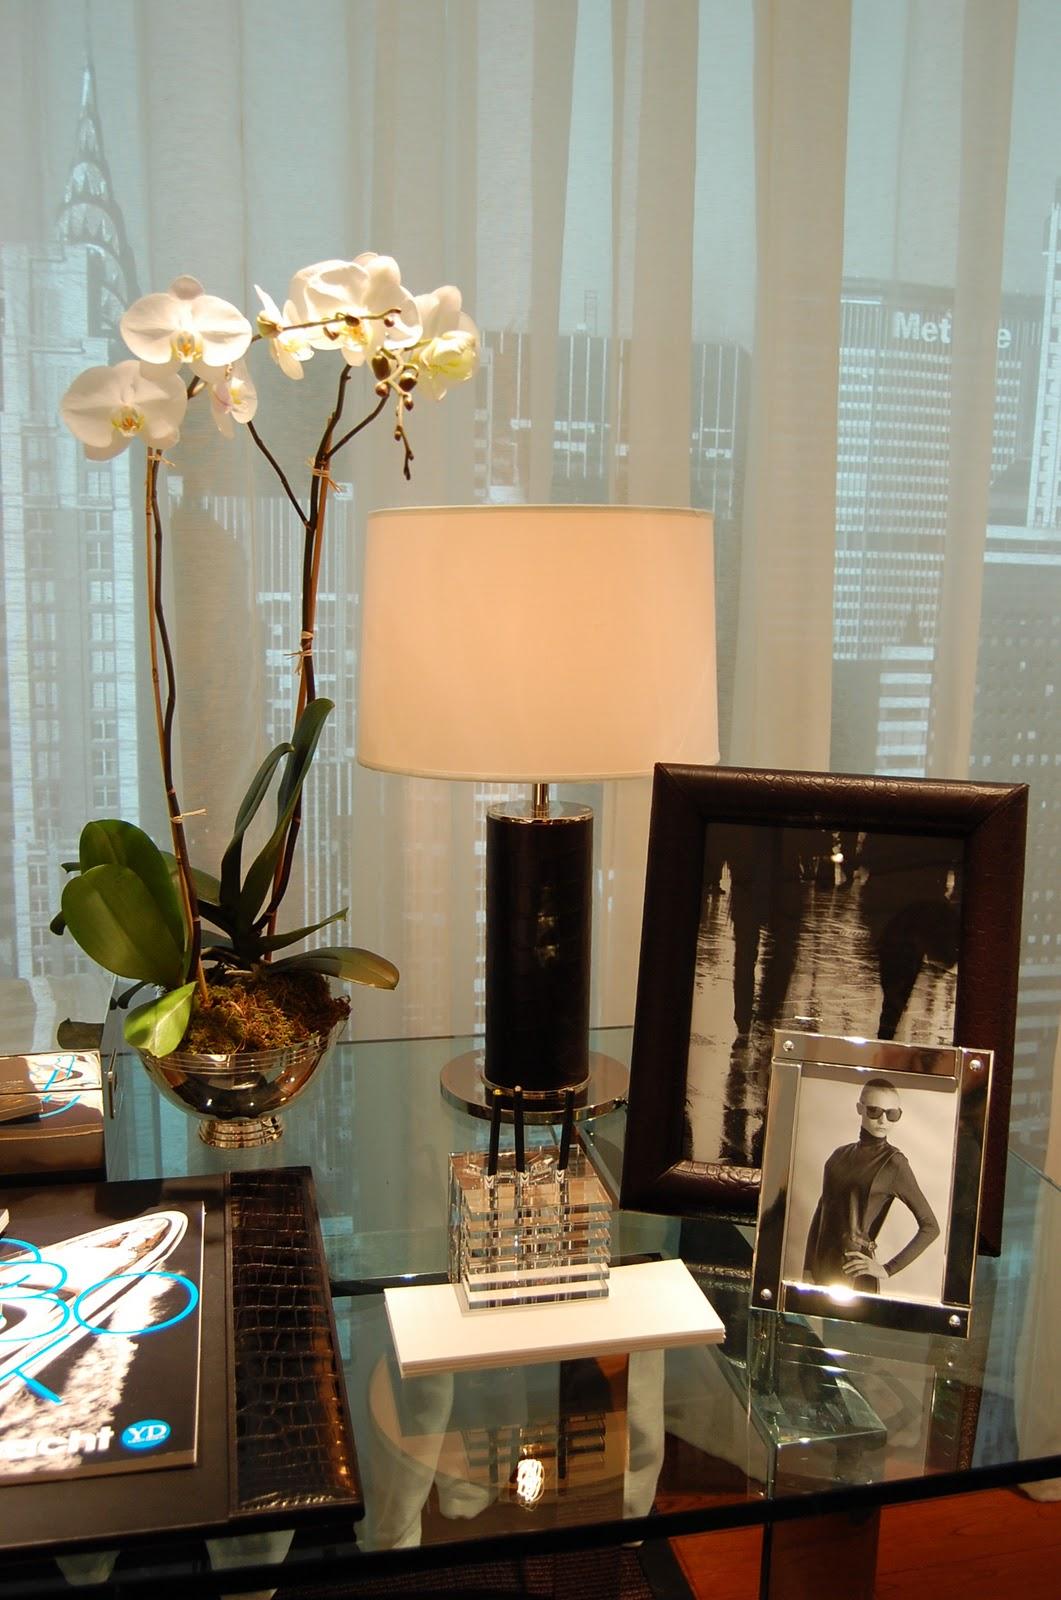 utah interior ralph lauren home part deux. Black Bedroom Furniture Sets. Home Design Ideas